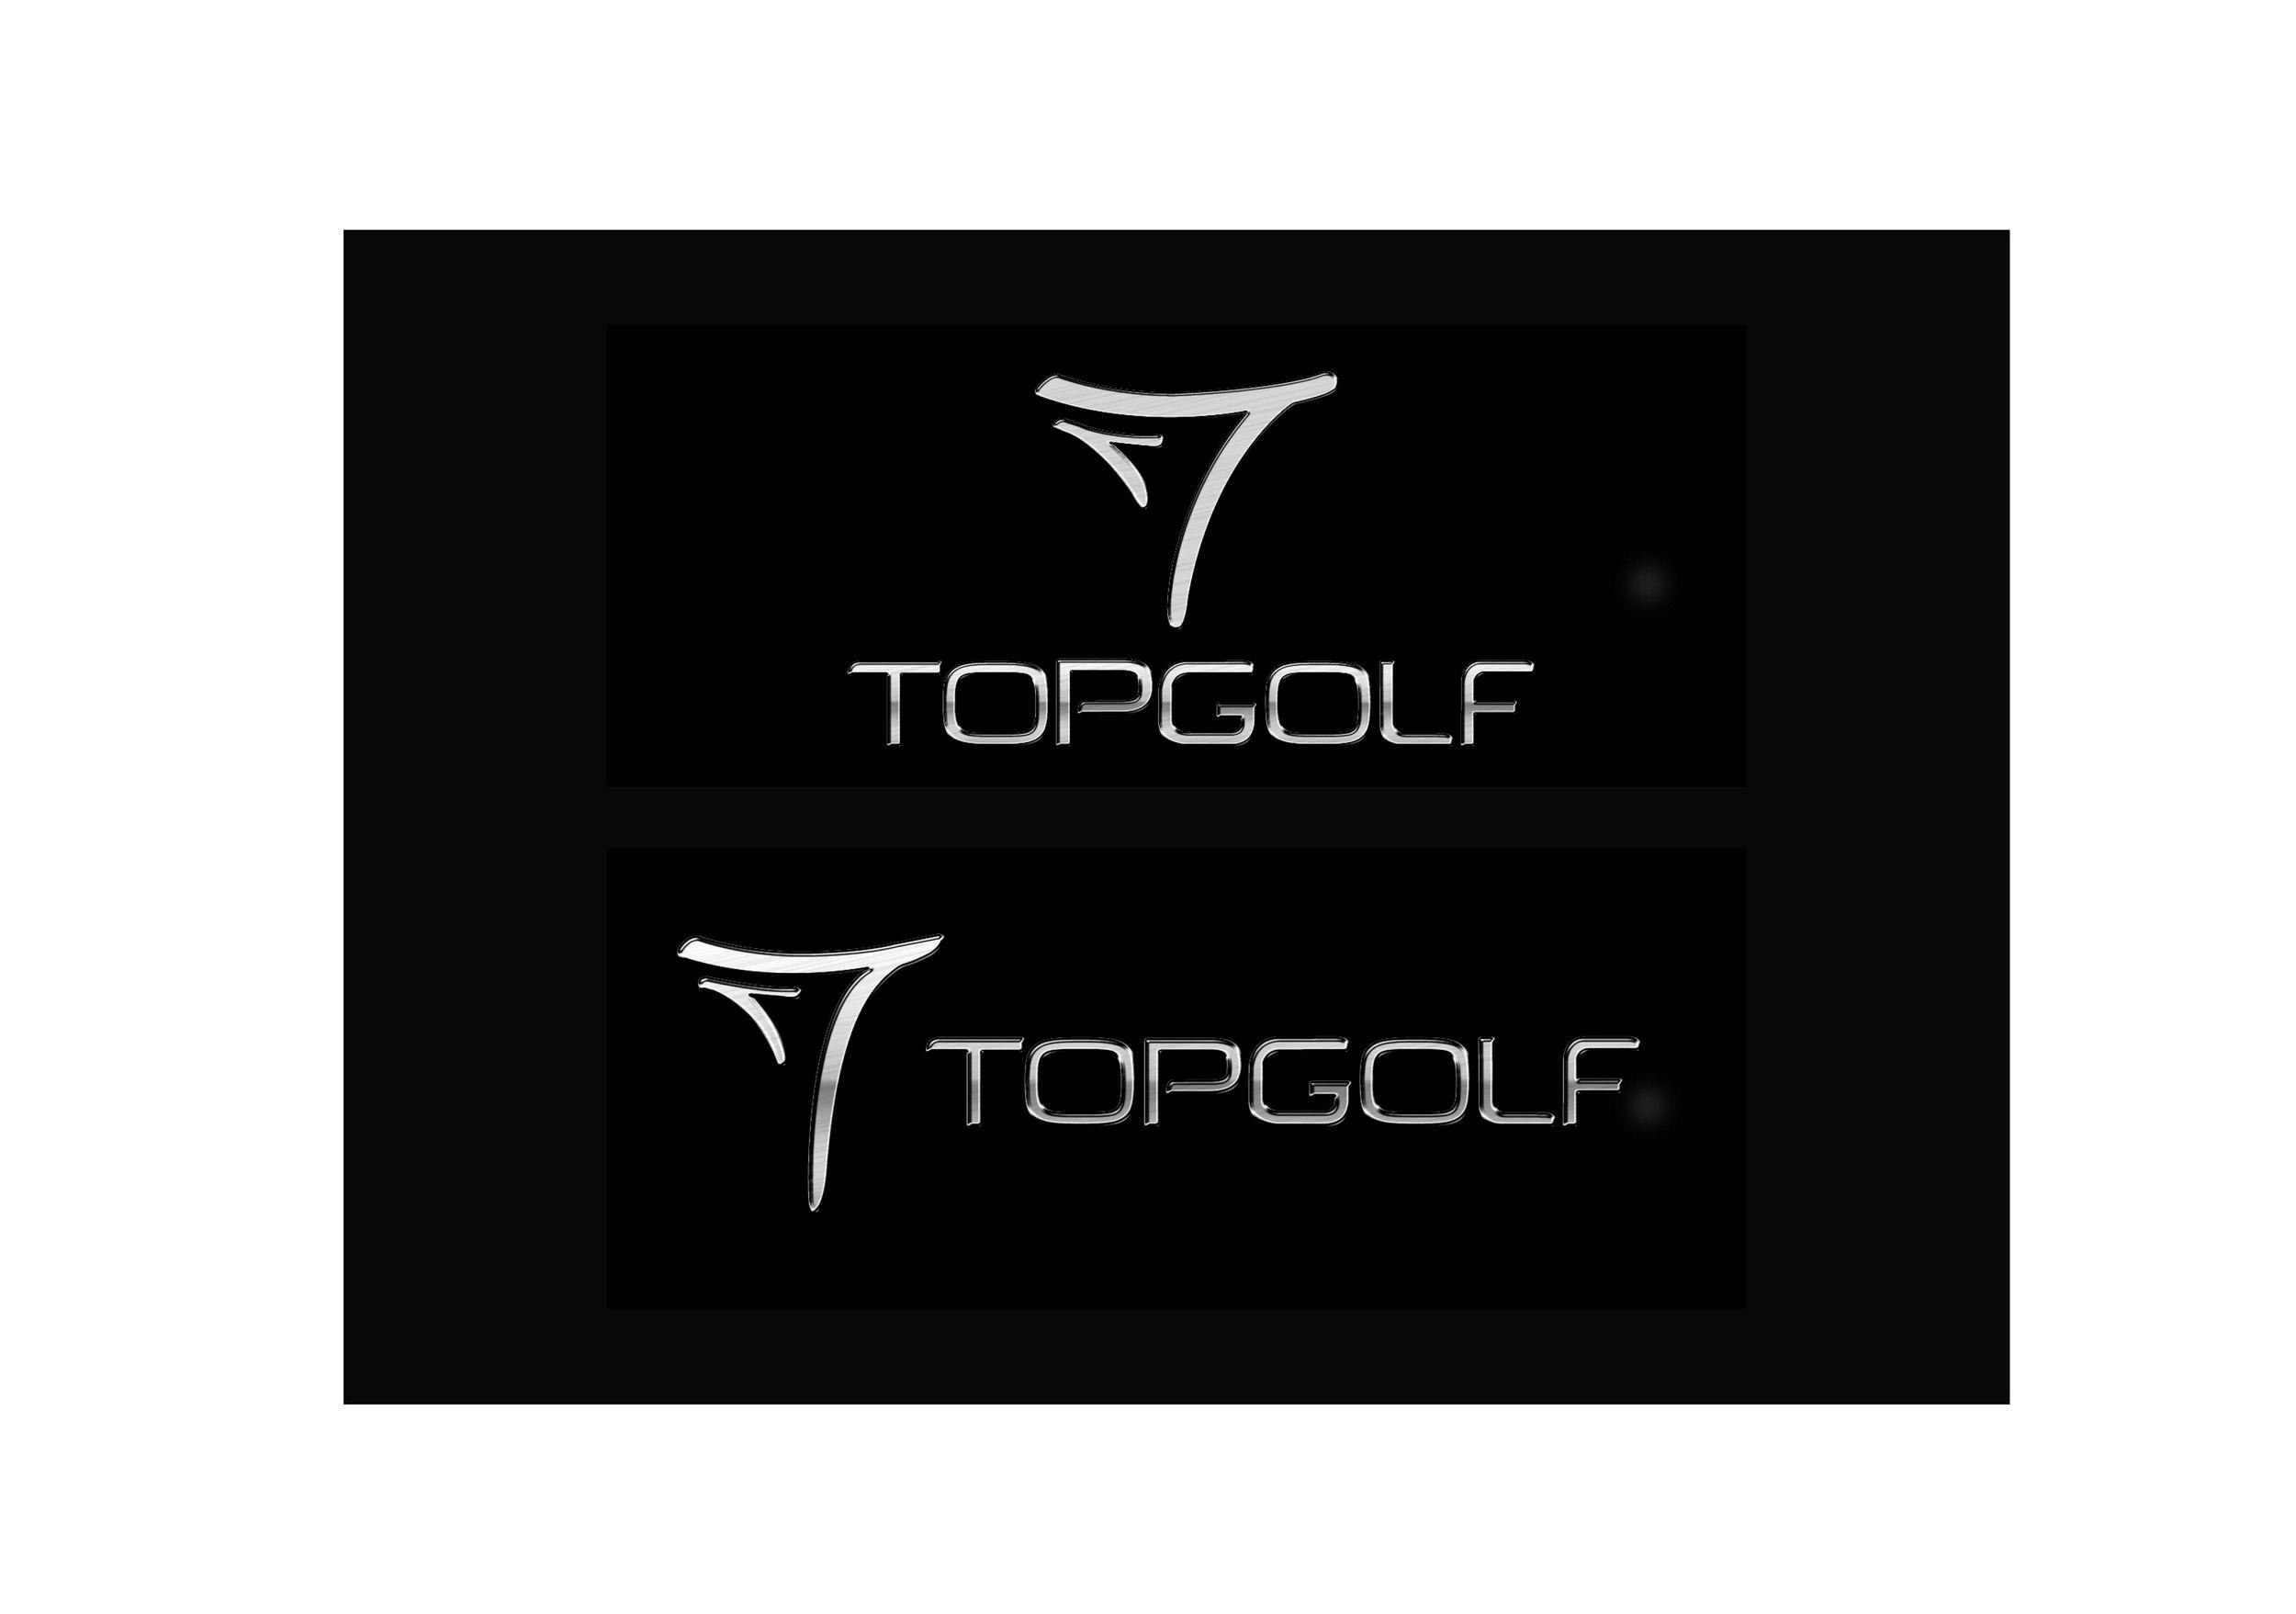 TOPGOLF-7.jpg